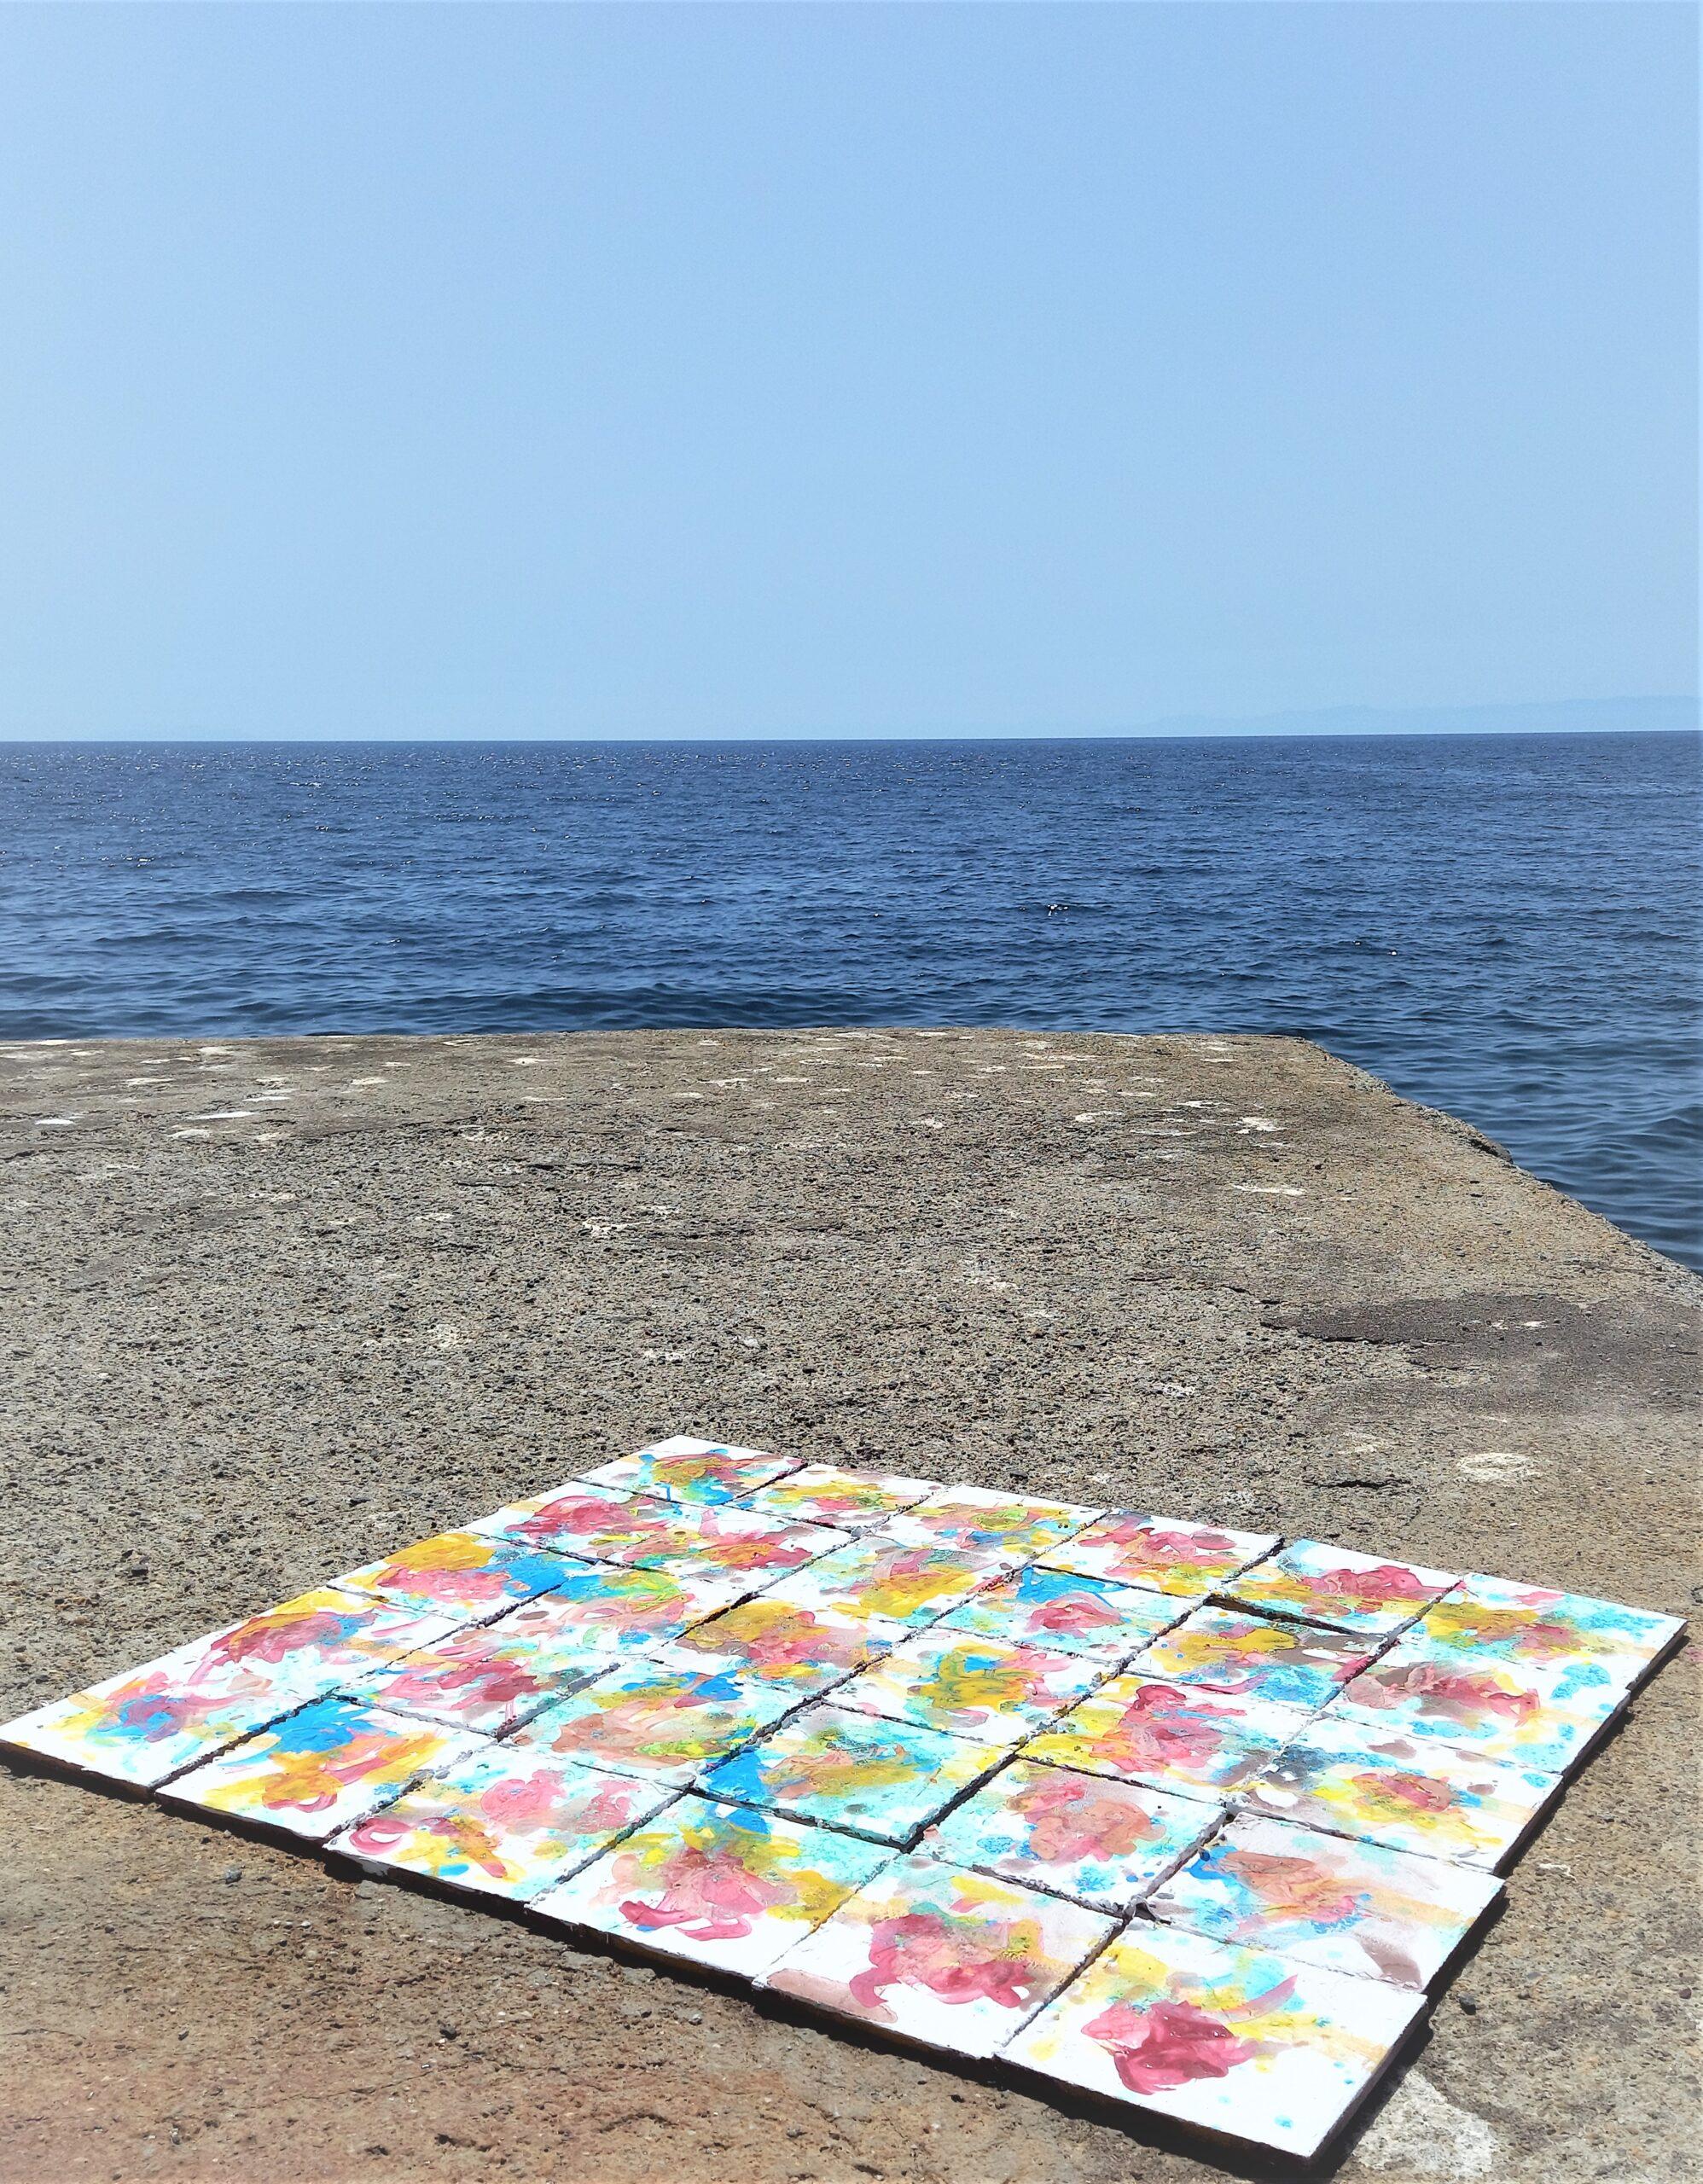 contemporary artist isole eolie alicudi connection isola lachea aci trezza